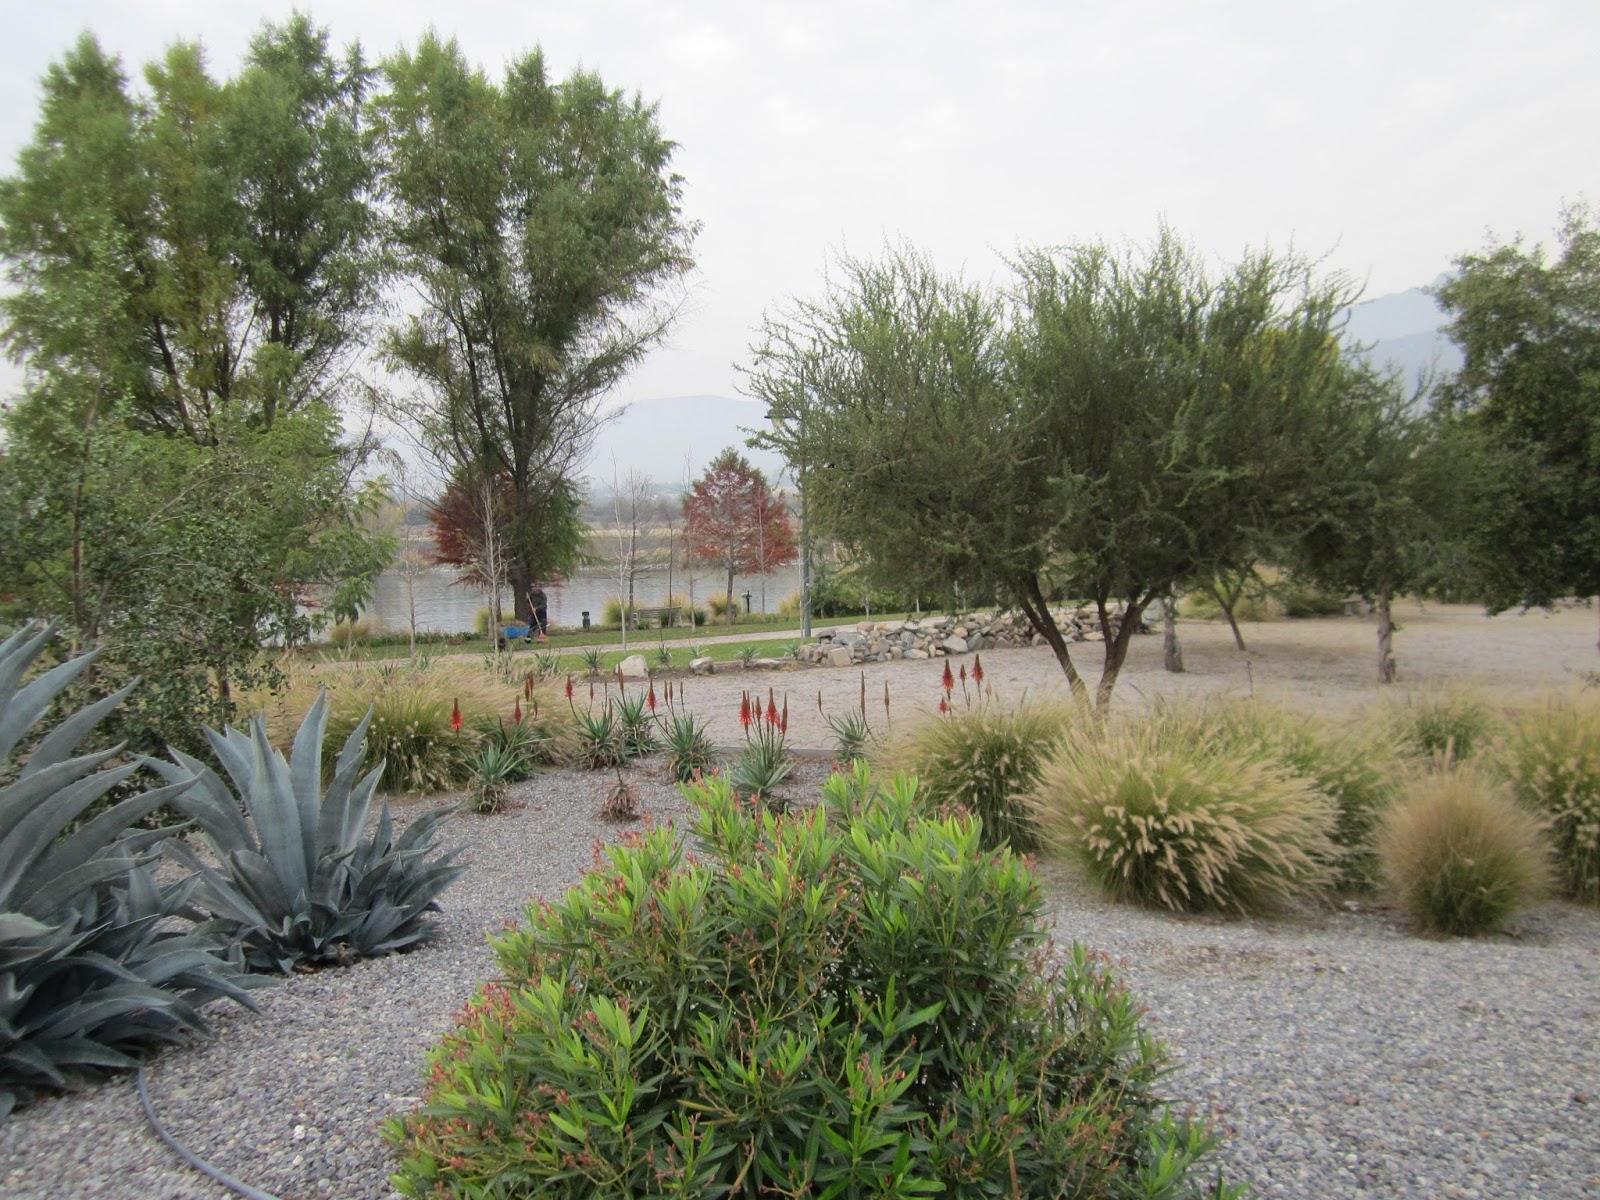 Paisajismo en chile for Paisajismos en jardines